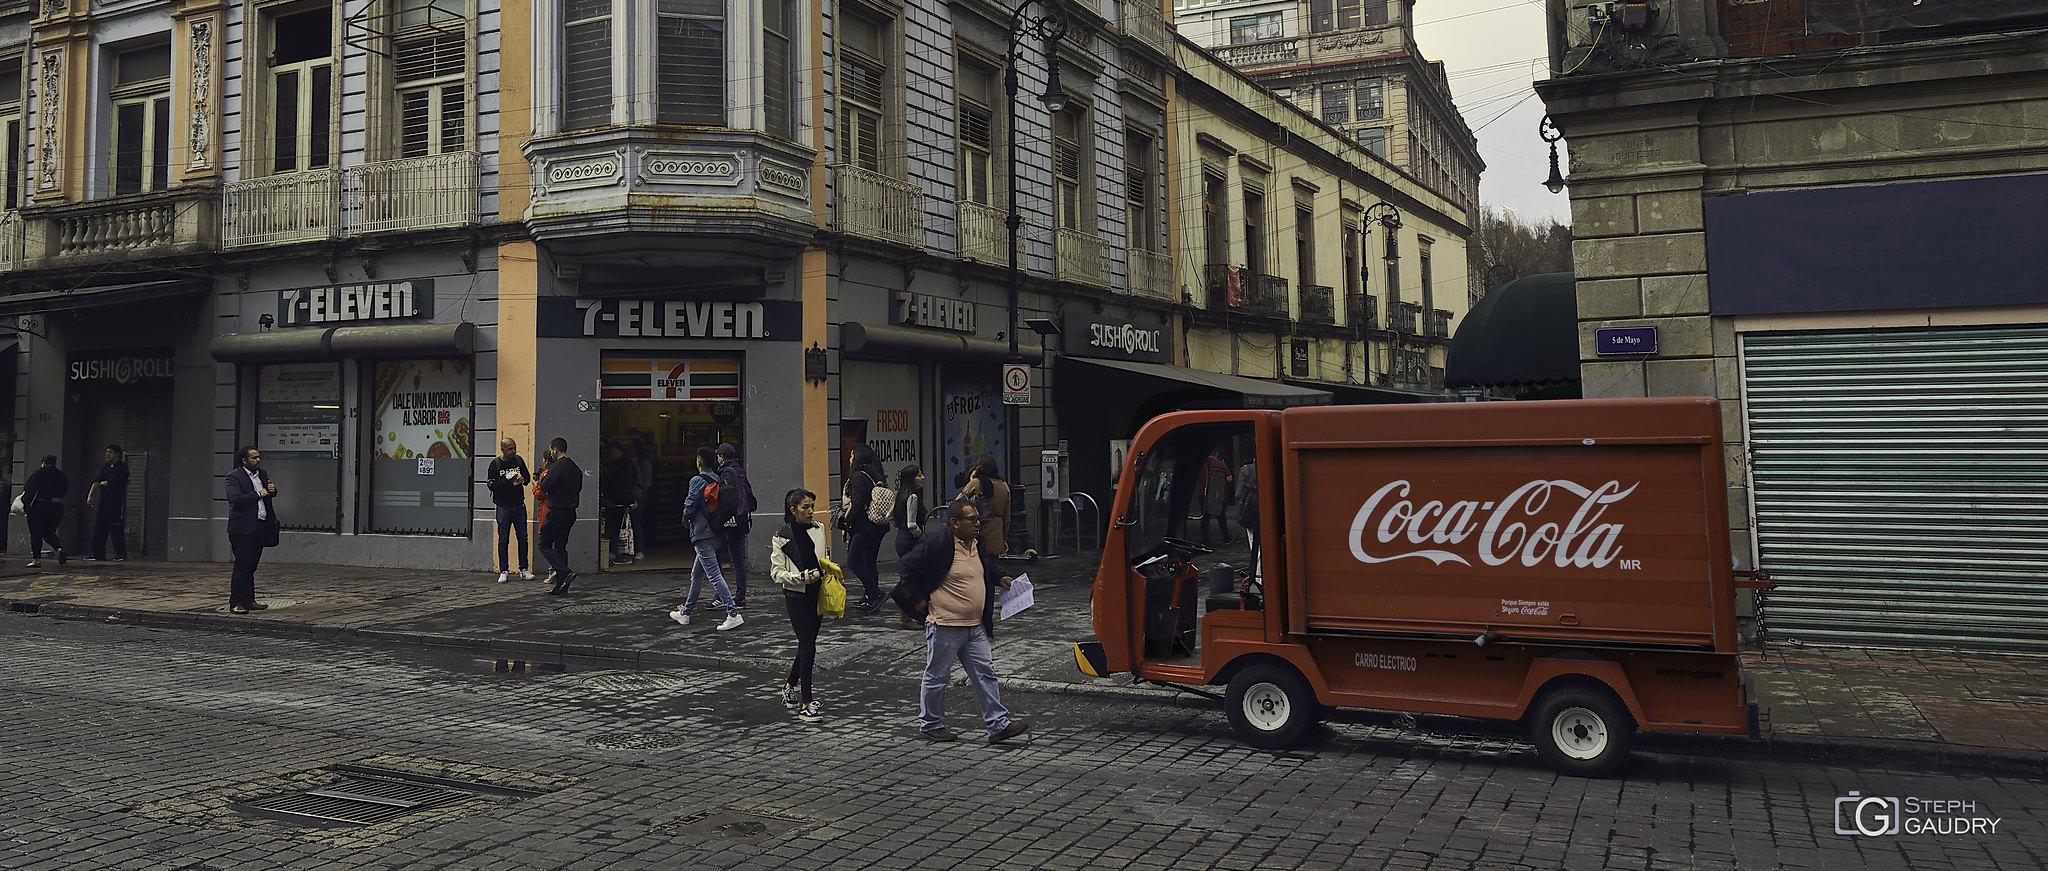 Coca Cola @ Mexico [Klik om de diavoorstelling te starten]